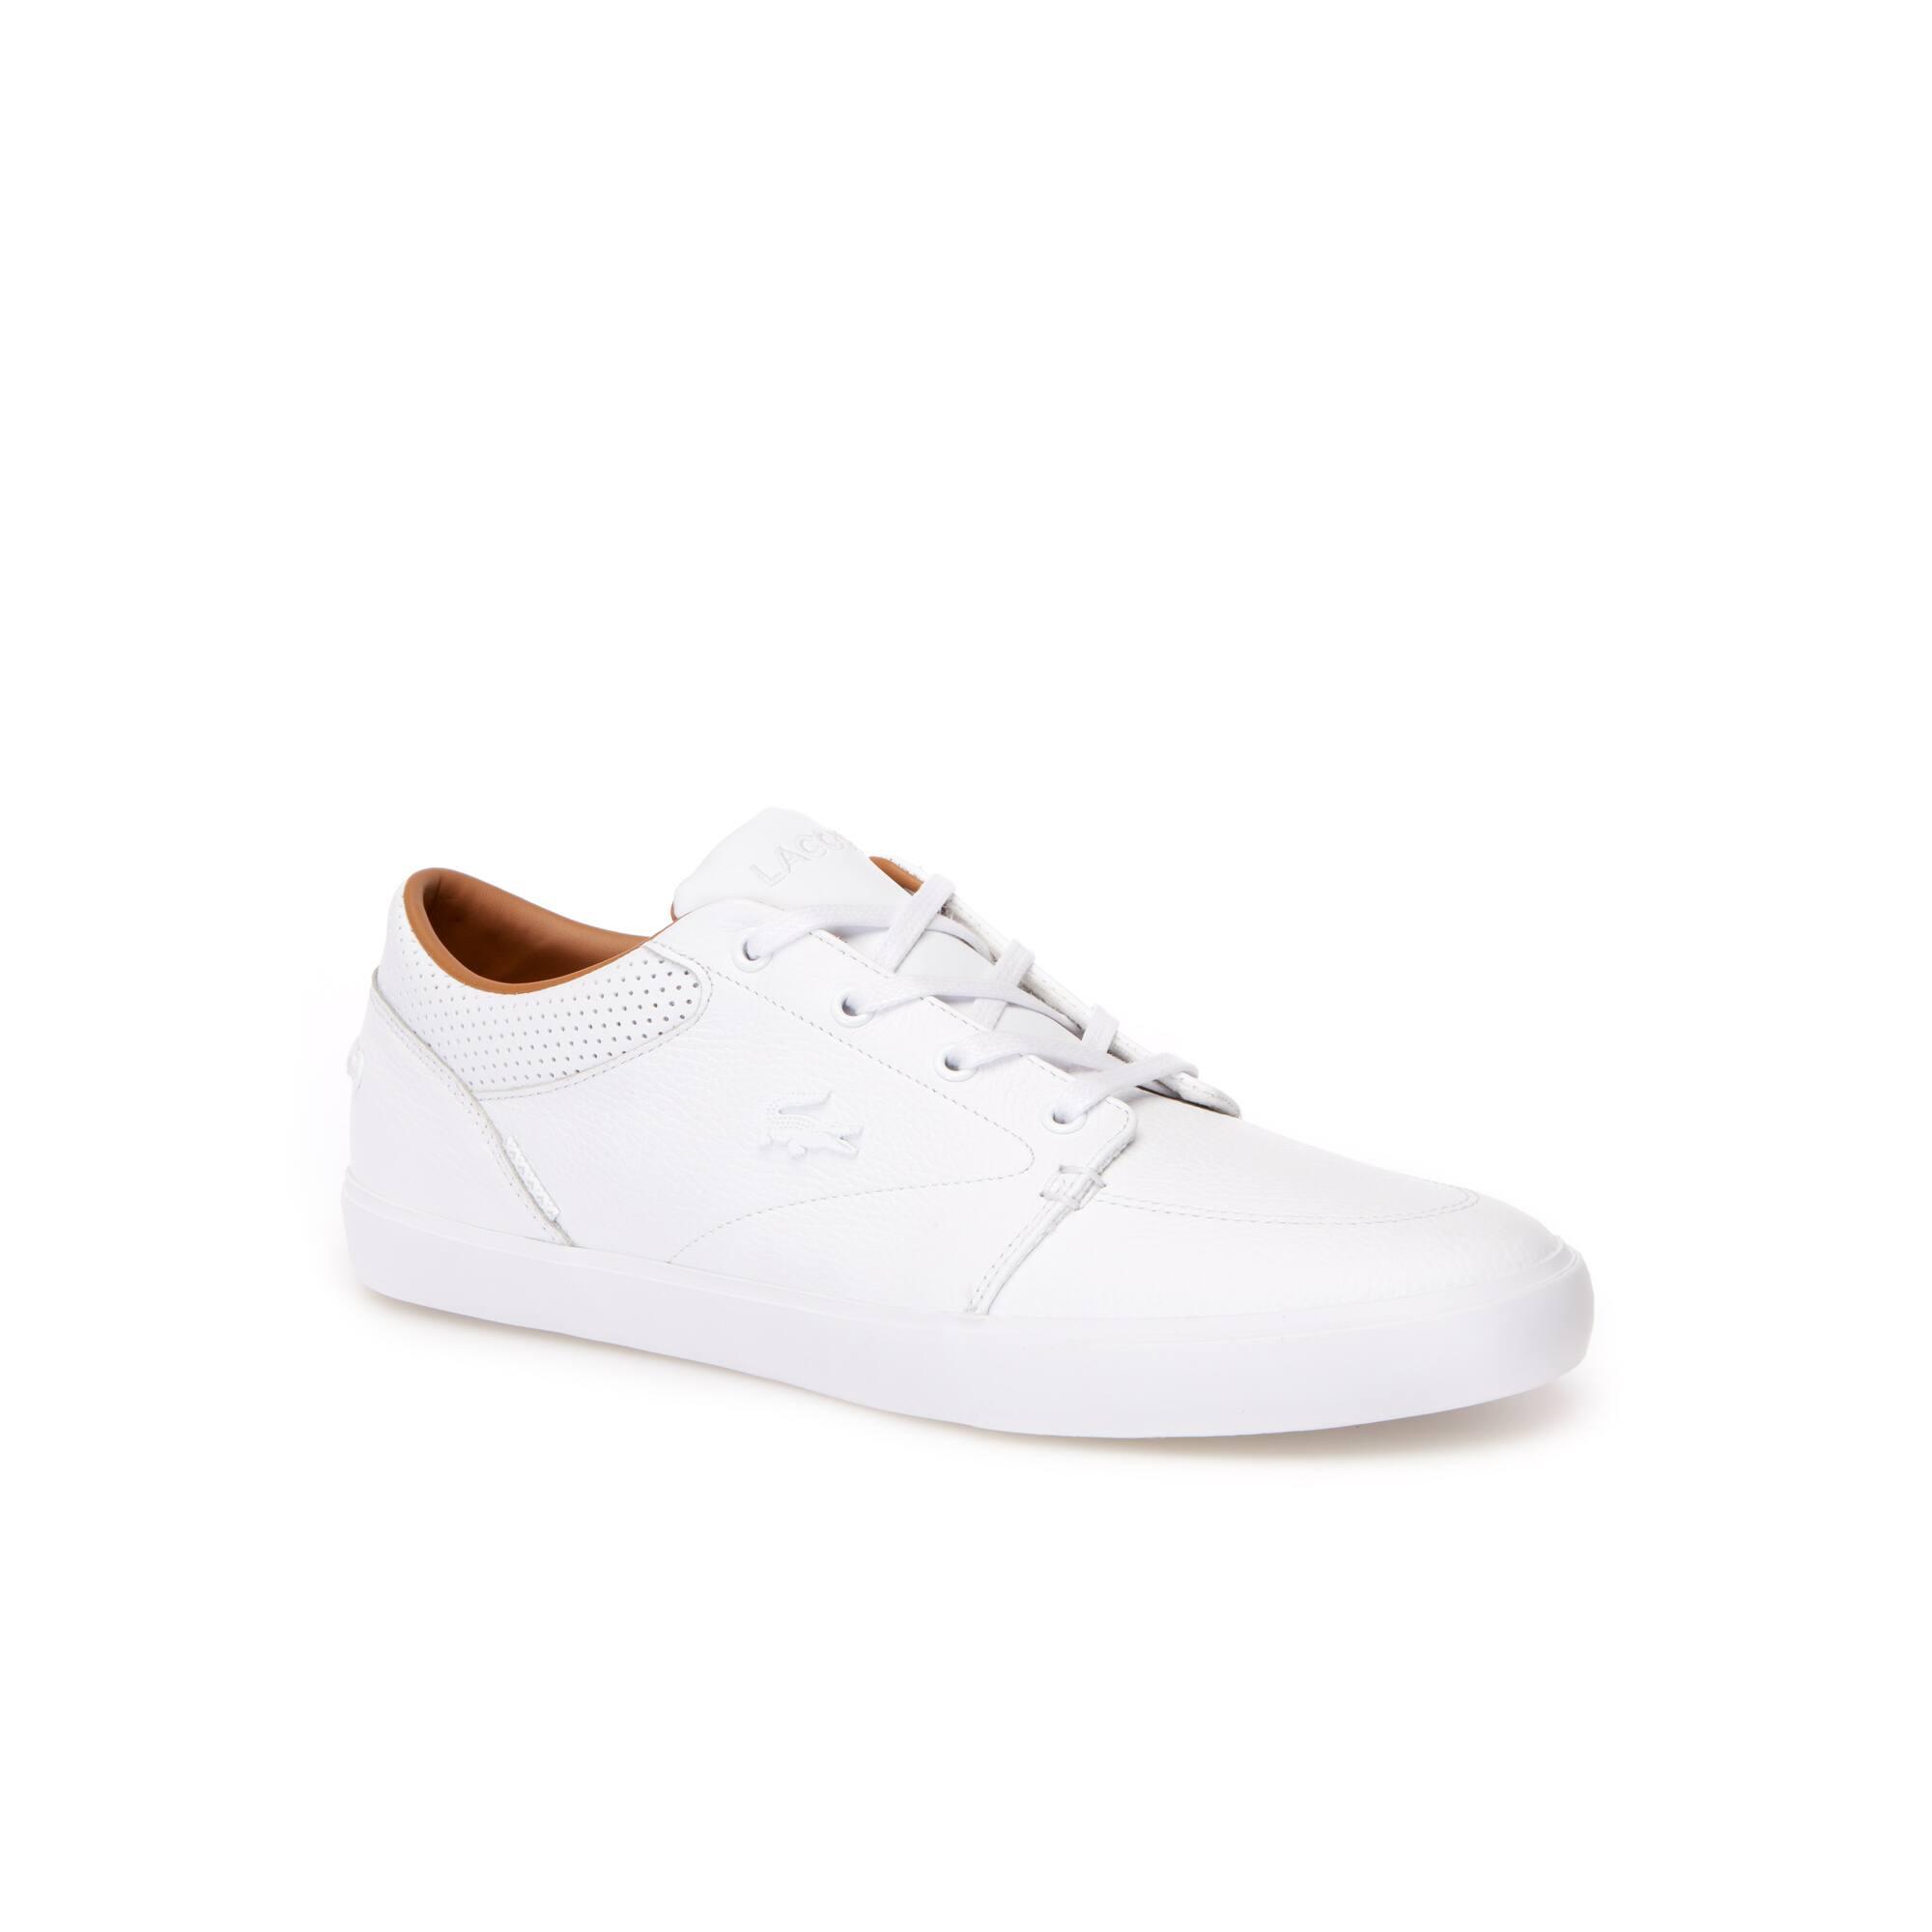 Sneakers basse con stringhe Bayliss VULC in pelle